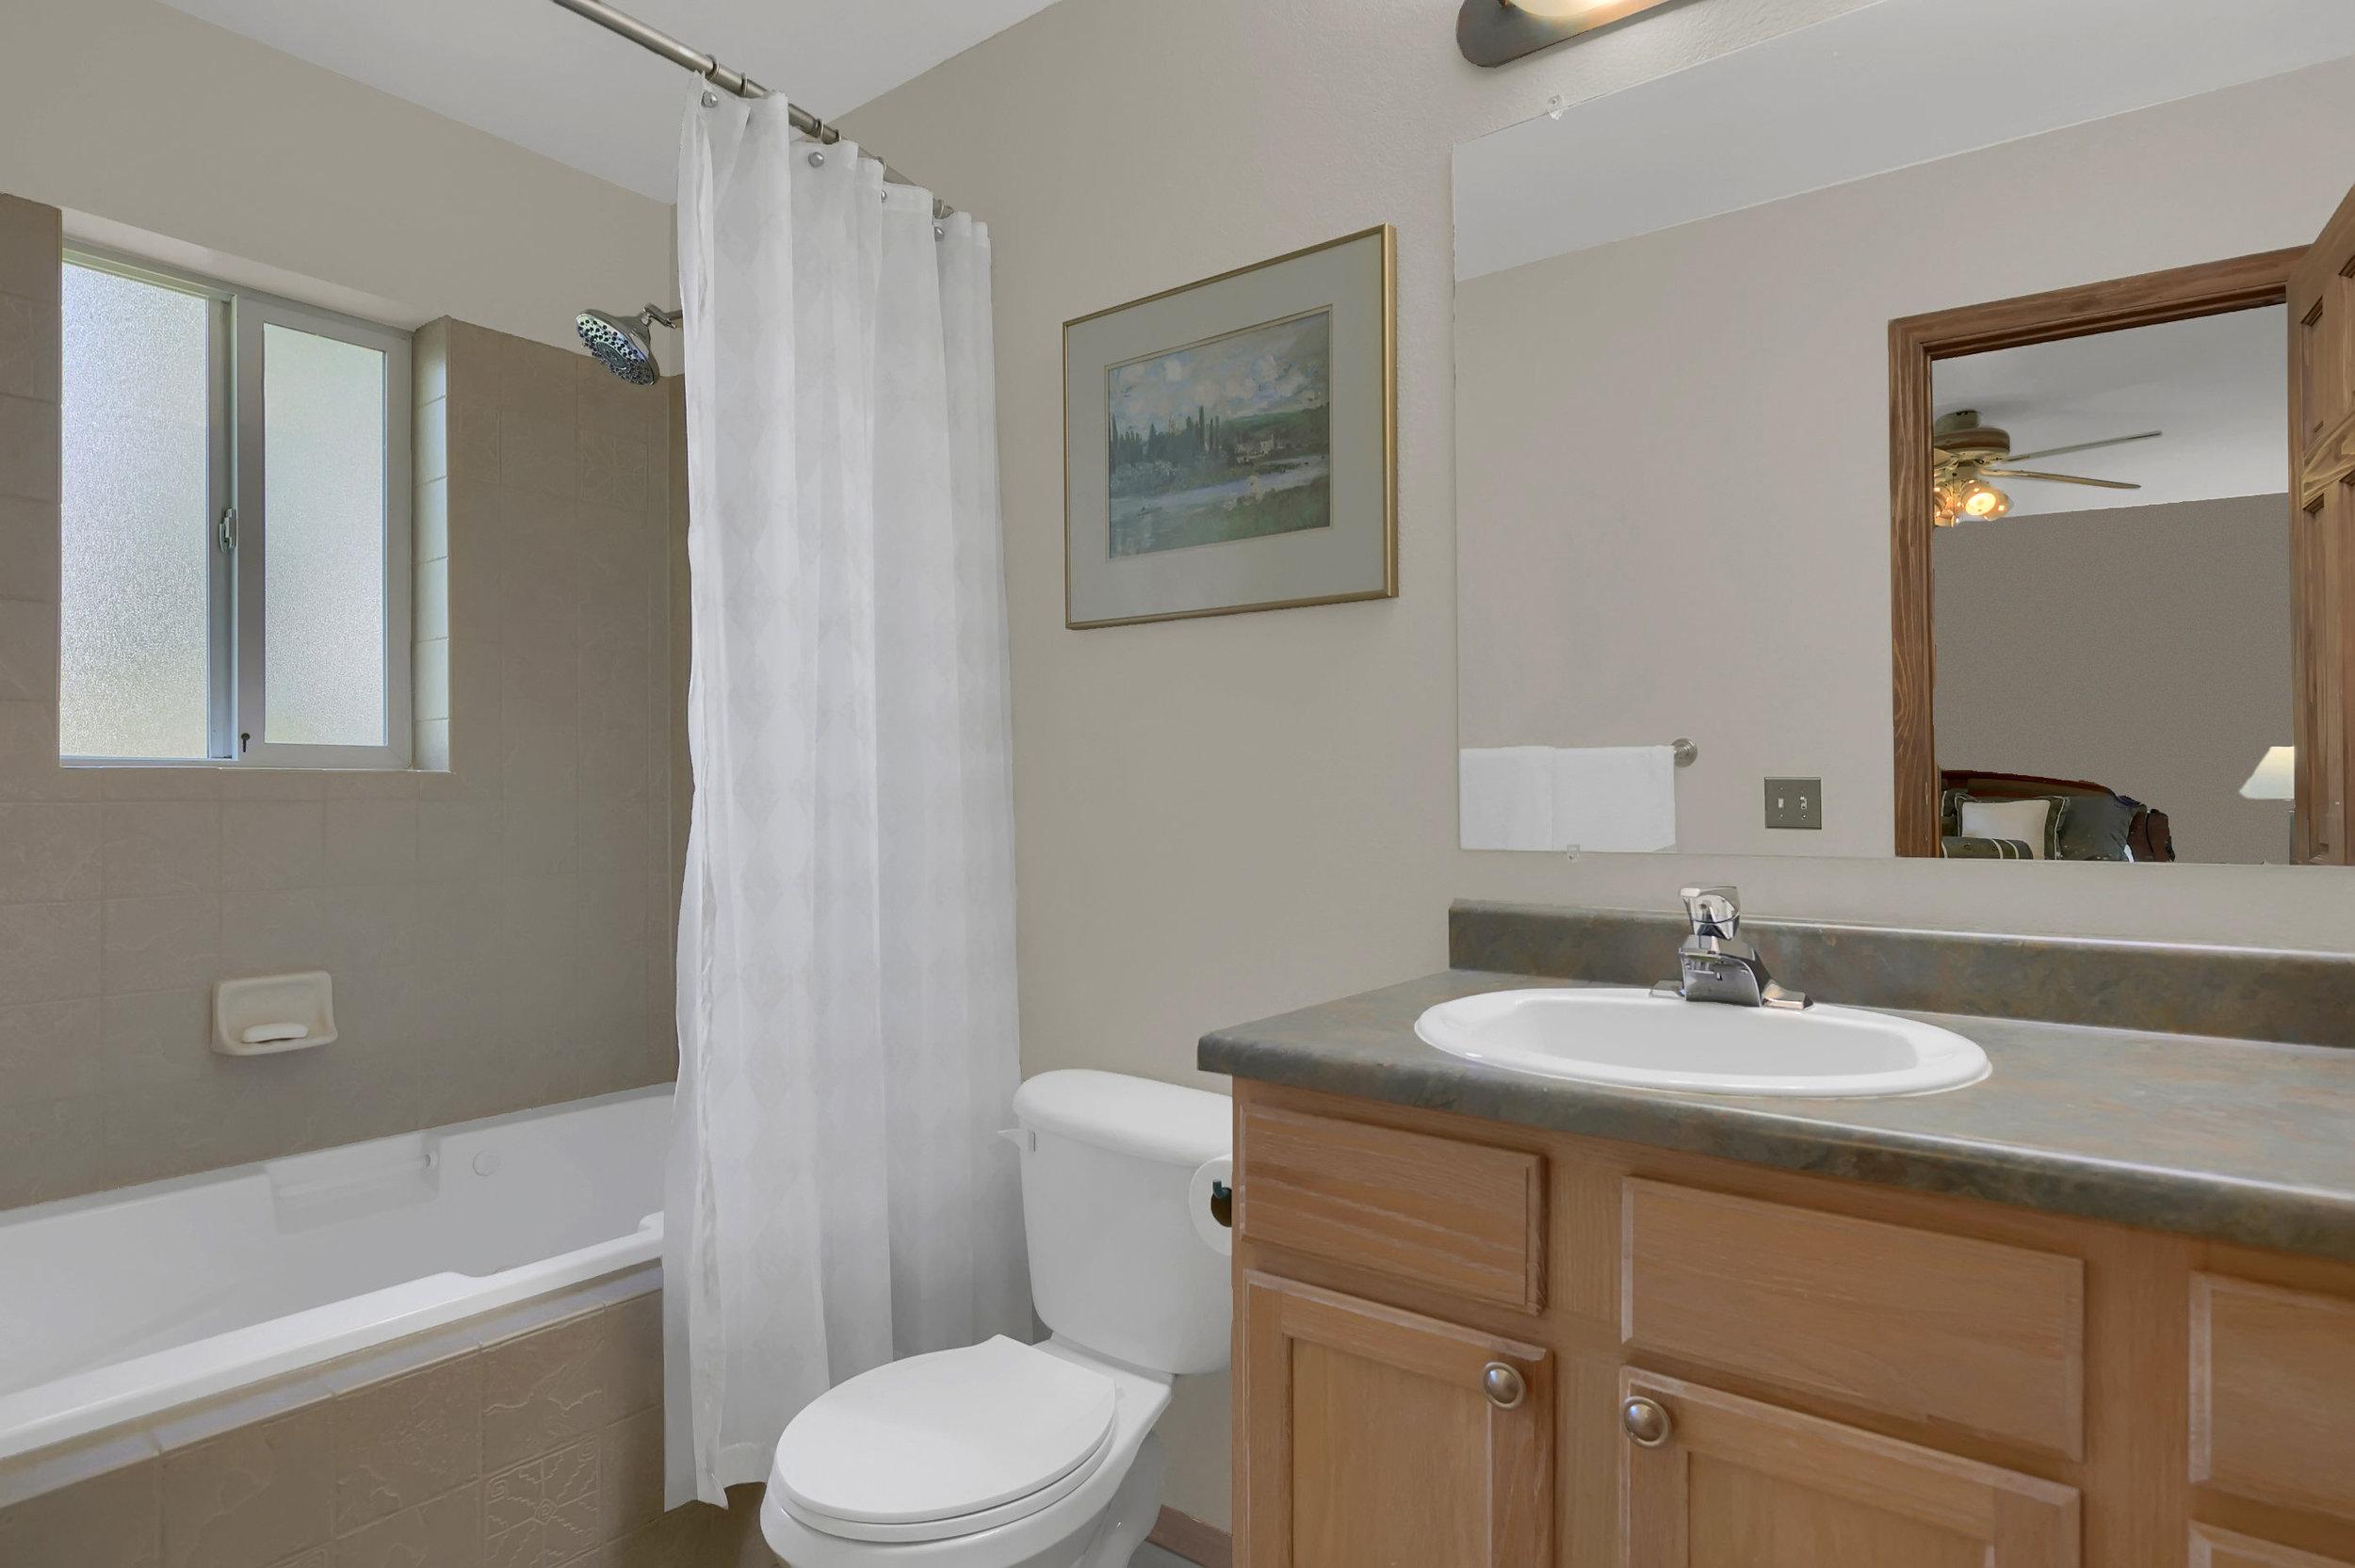 1605 Vickers Drive Colorado-print-020-005-Bathroom-2800x1865-300dpi.jpg